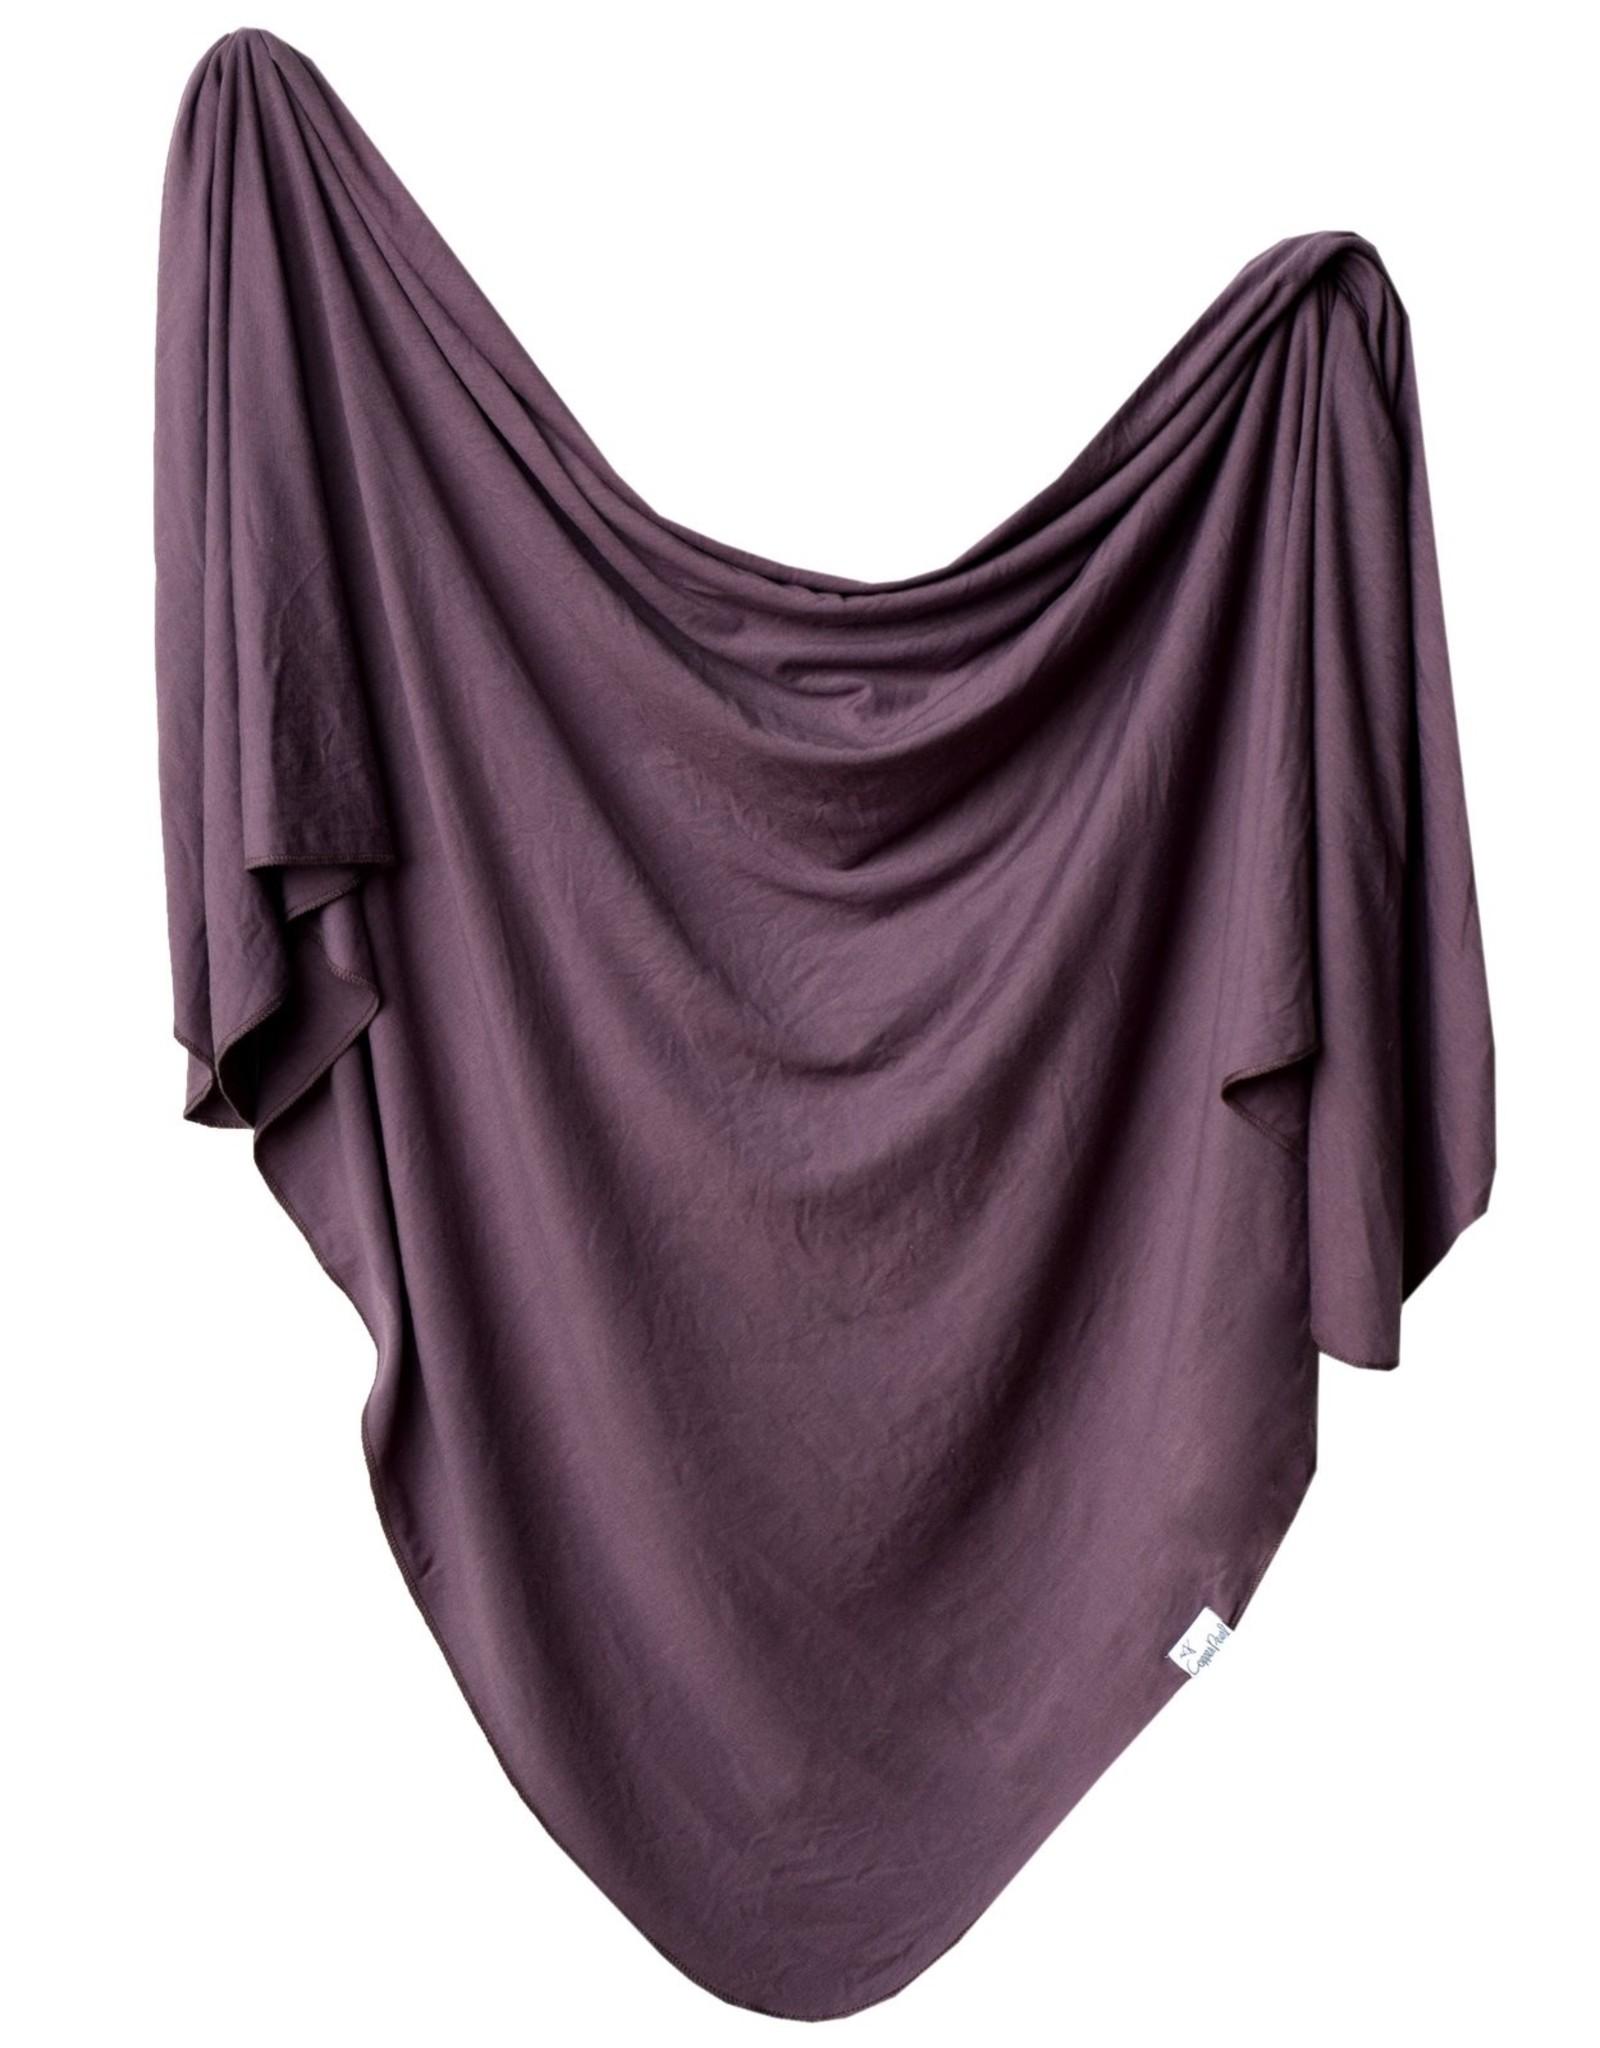 Copper Pearl Plum Swaddle Blanket Copper Pearl